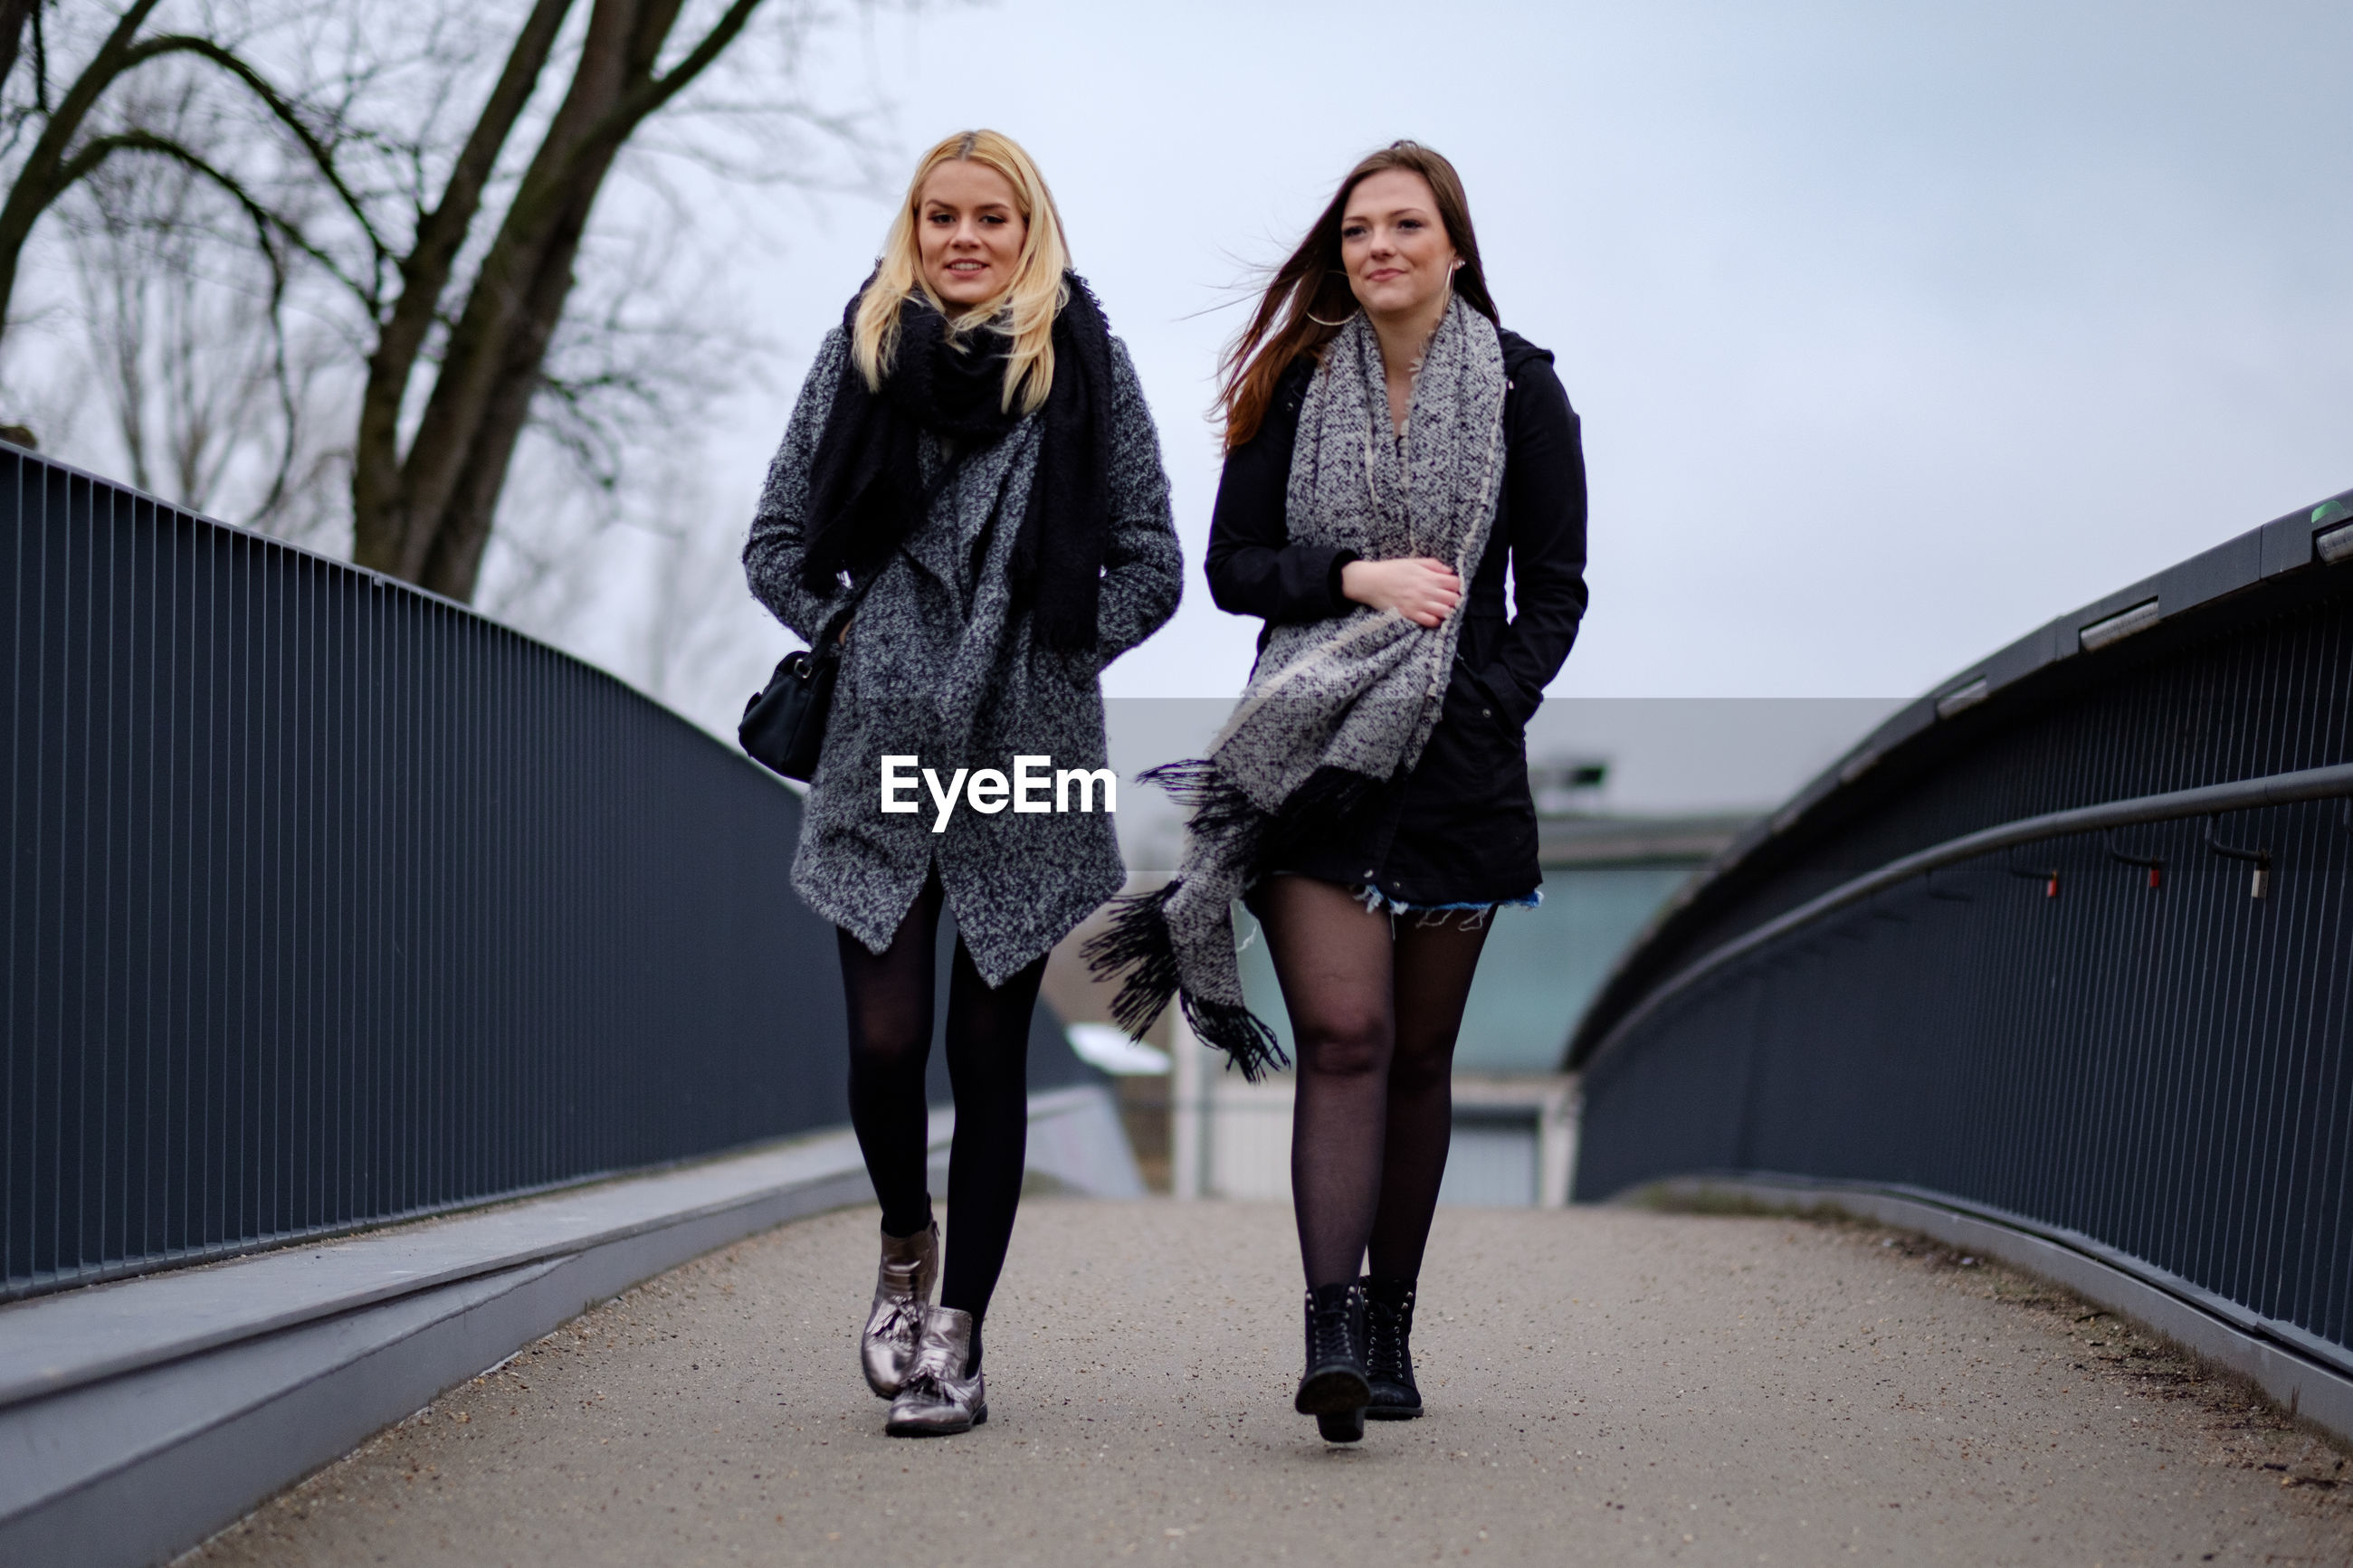 Young women walking on footbridge against sky